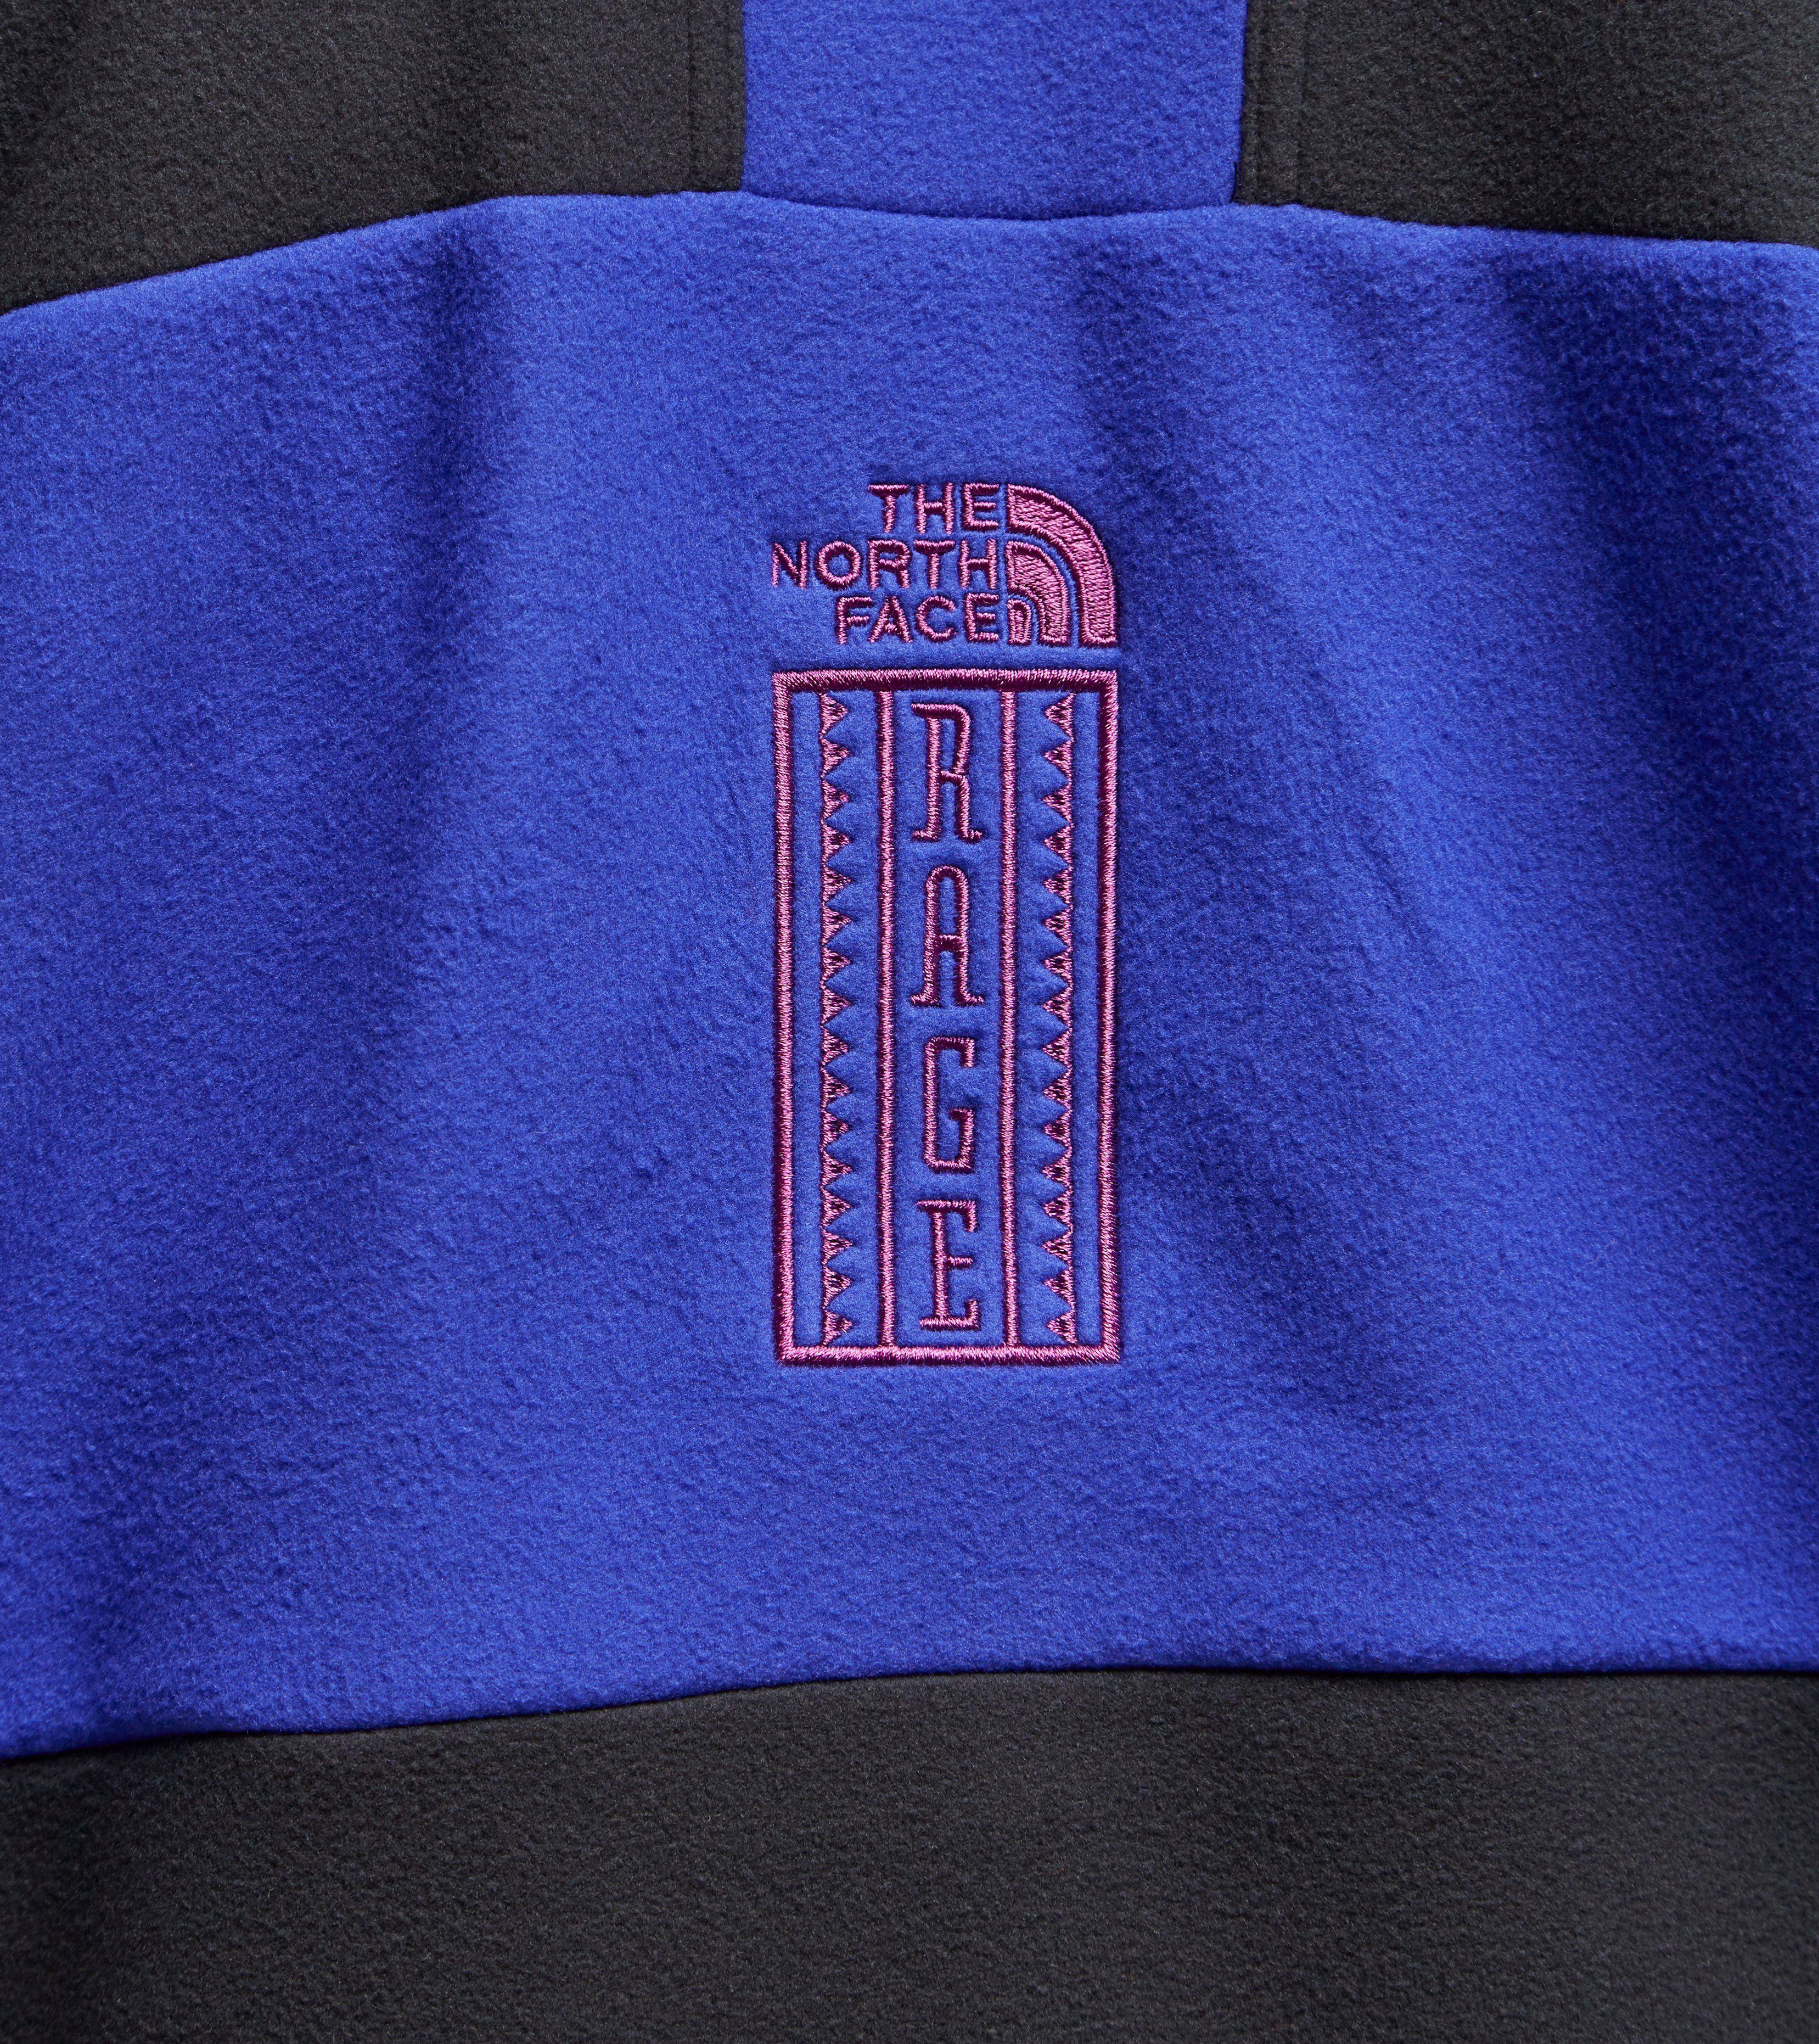 The North Face Rage '92 Retro Fleece 1/2 Zip Sweatshirt